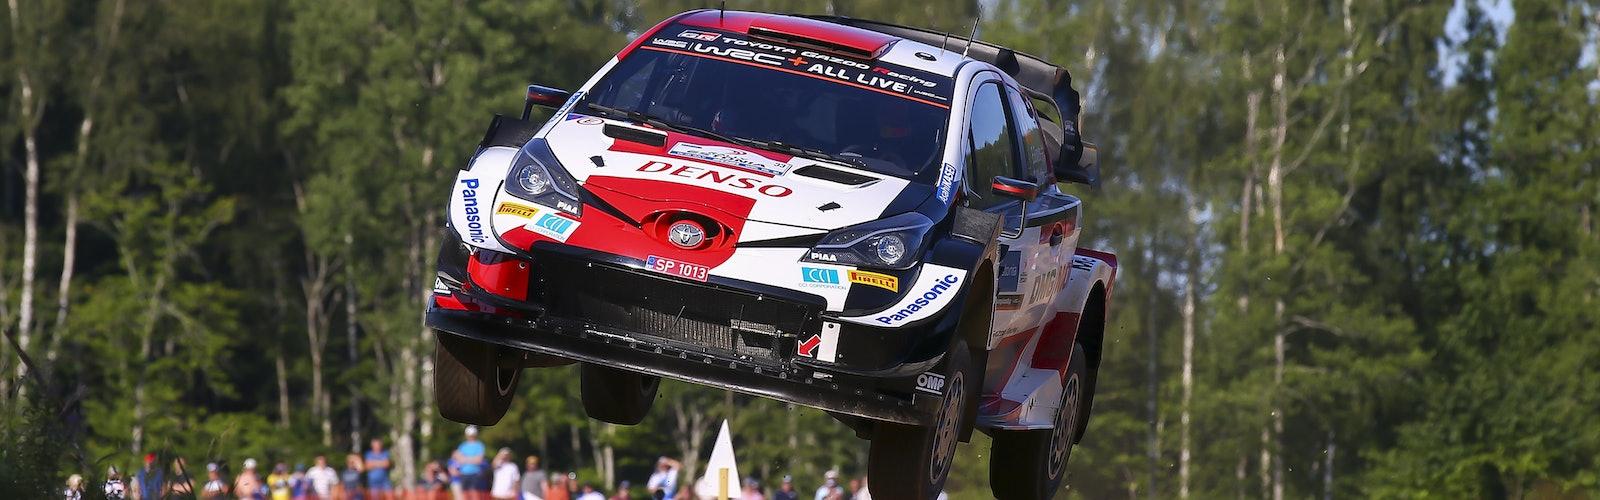 WRC_2021_Rd.7_247